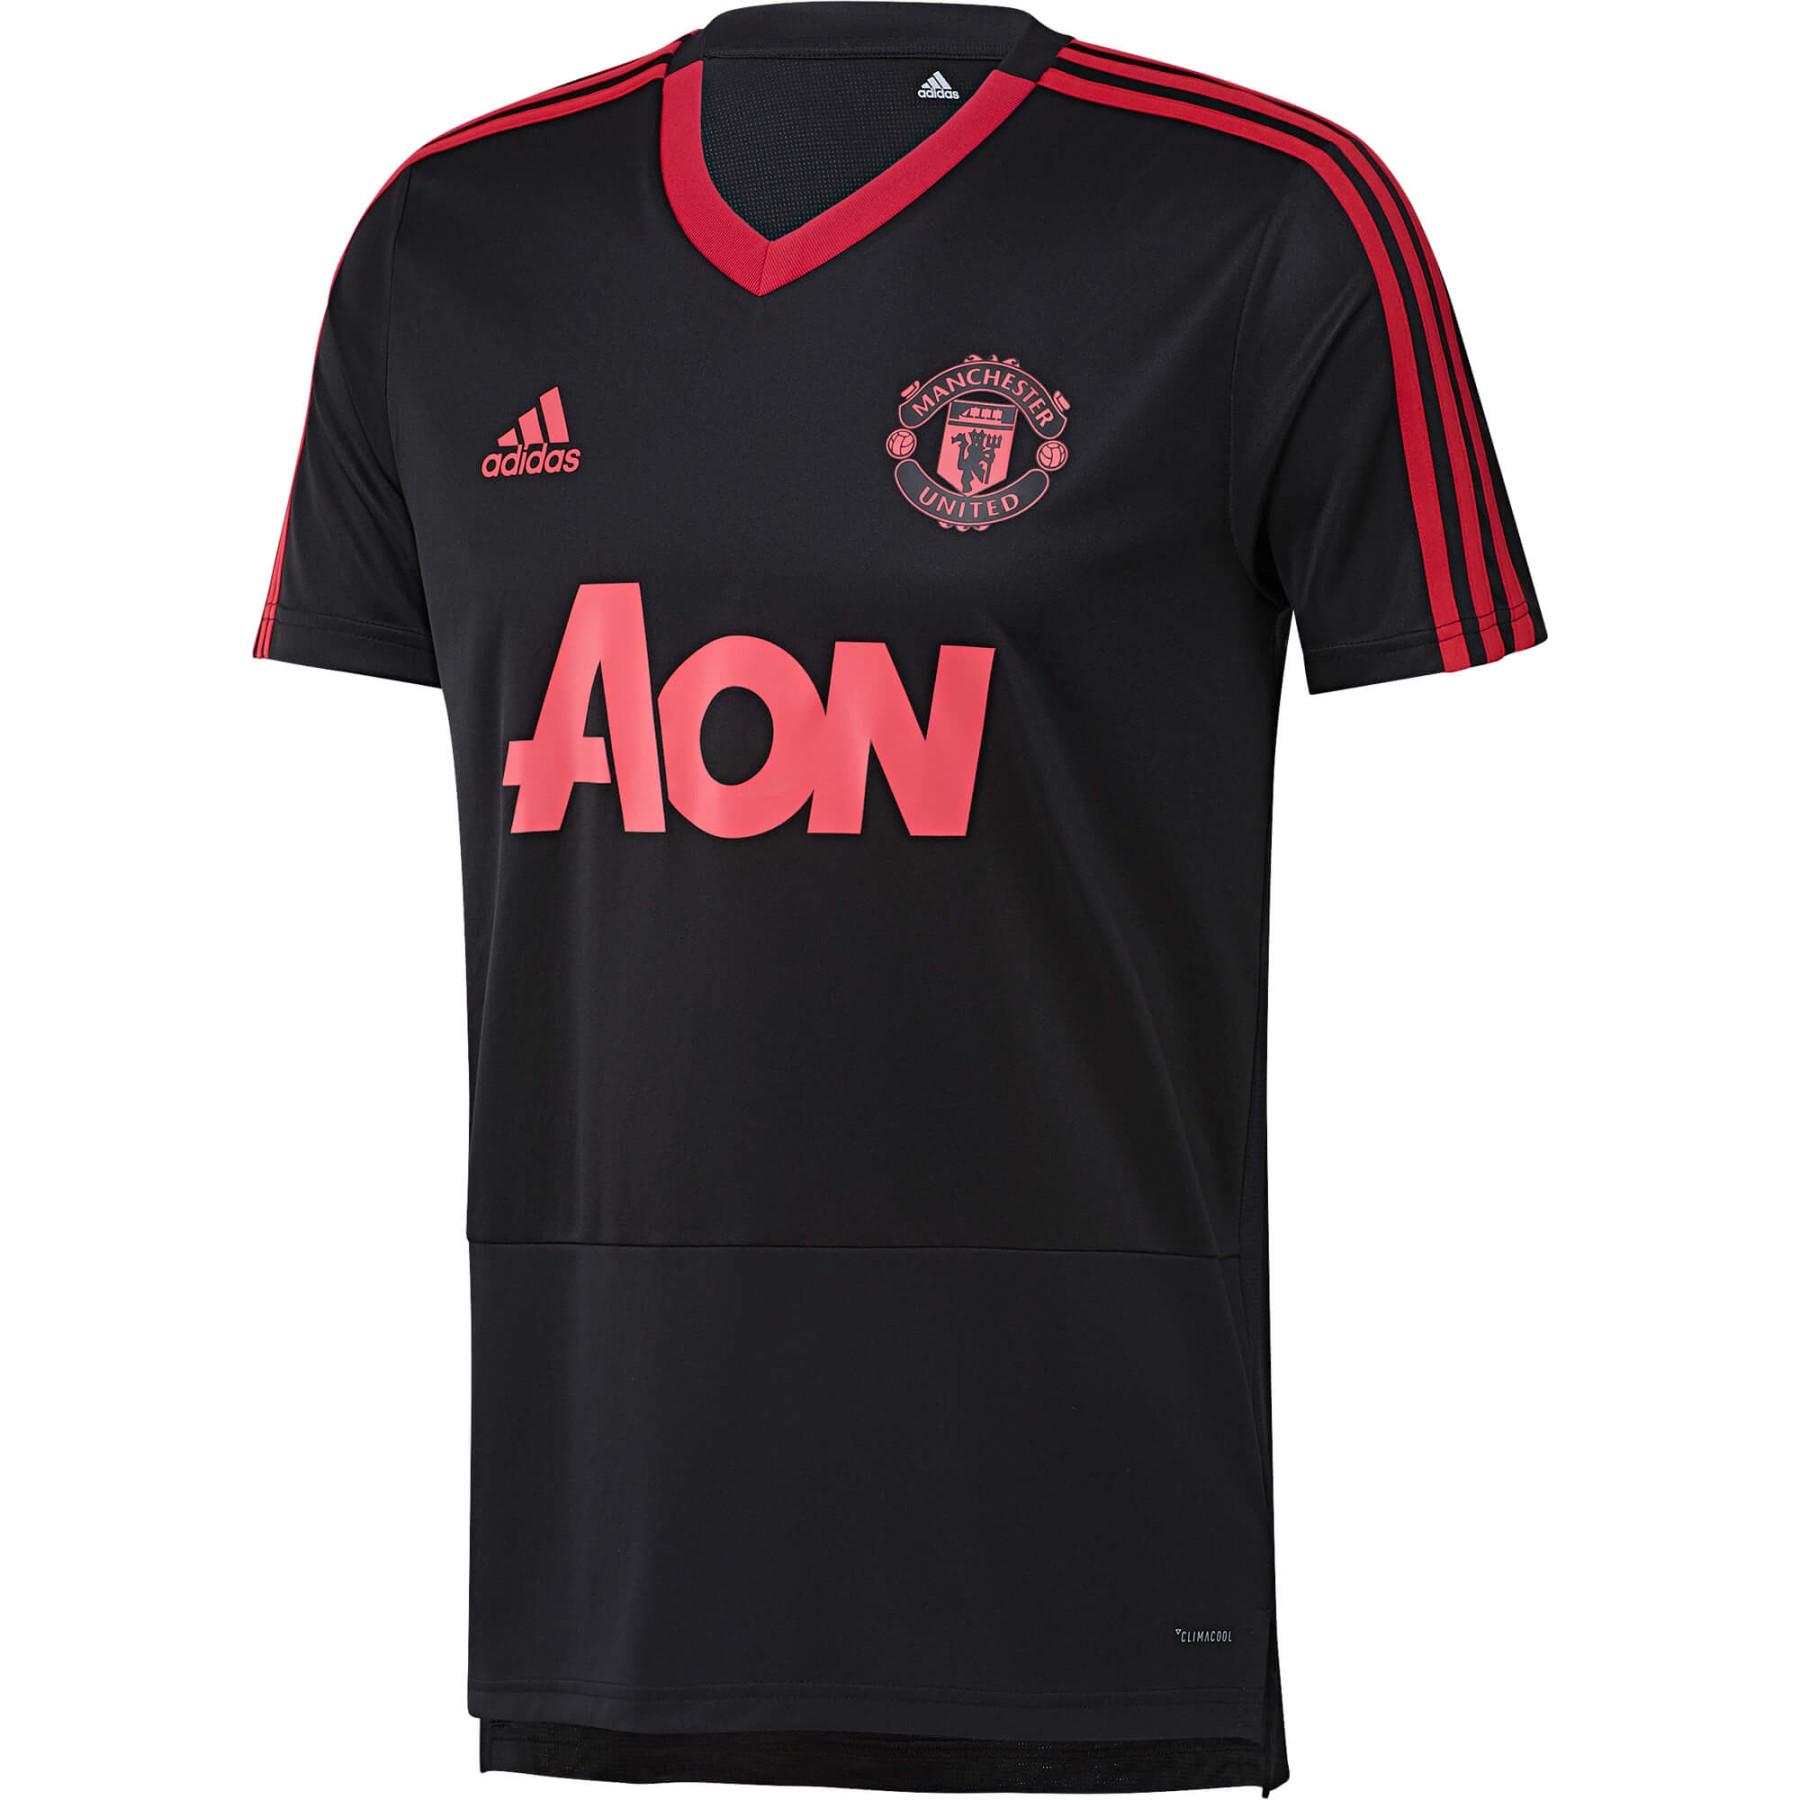 Adidas Manchester United Maillot Entrainement Noir 2018